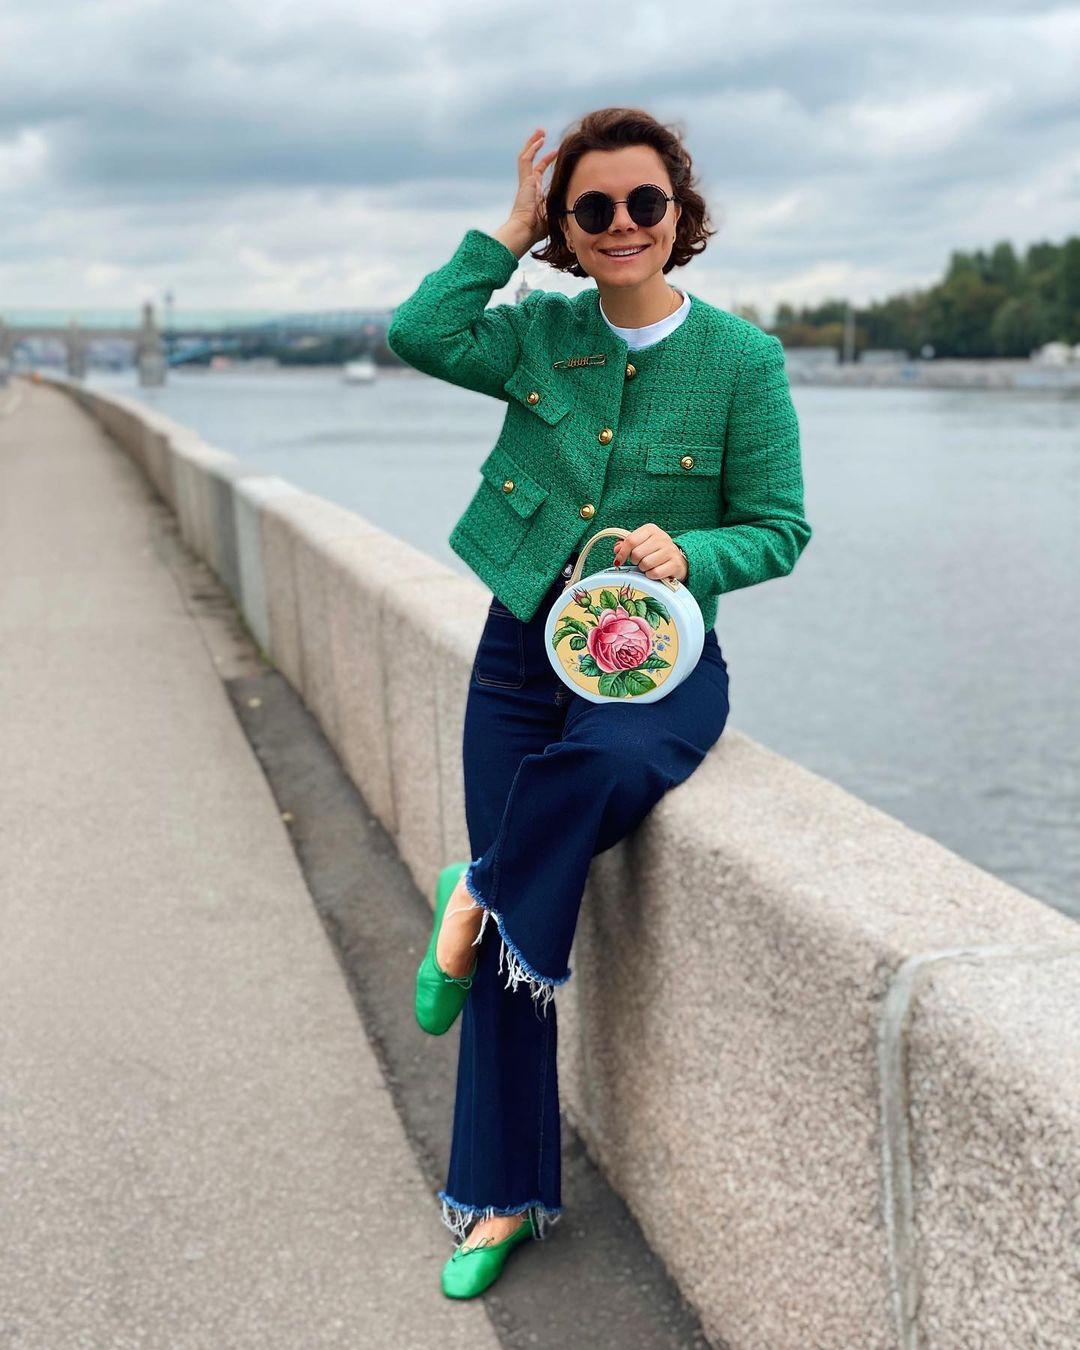 Tatyana Brukhunova discussed a comparison of her appearance with Elizaveta Boyarskaya